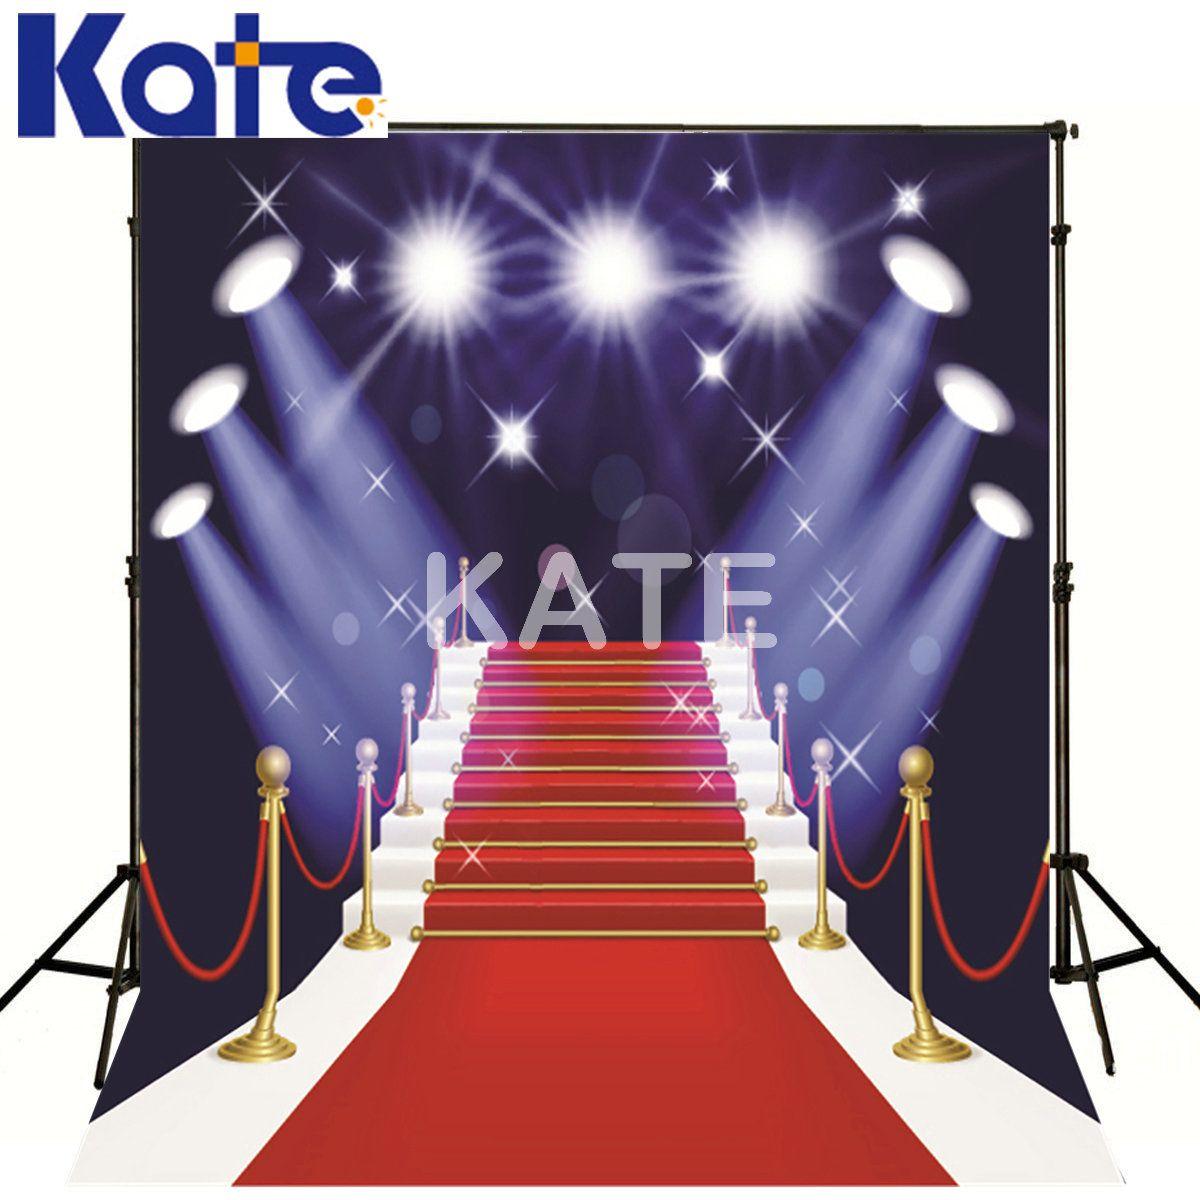 Find More Background Information About Kate Photo Studio Backdrop Red Carpet Ladder Stage Lighting Kat Red Carpet Backdrop Photography Backdrops Light Backdrop